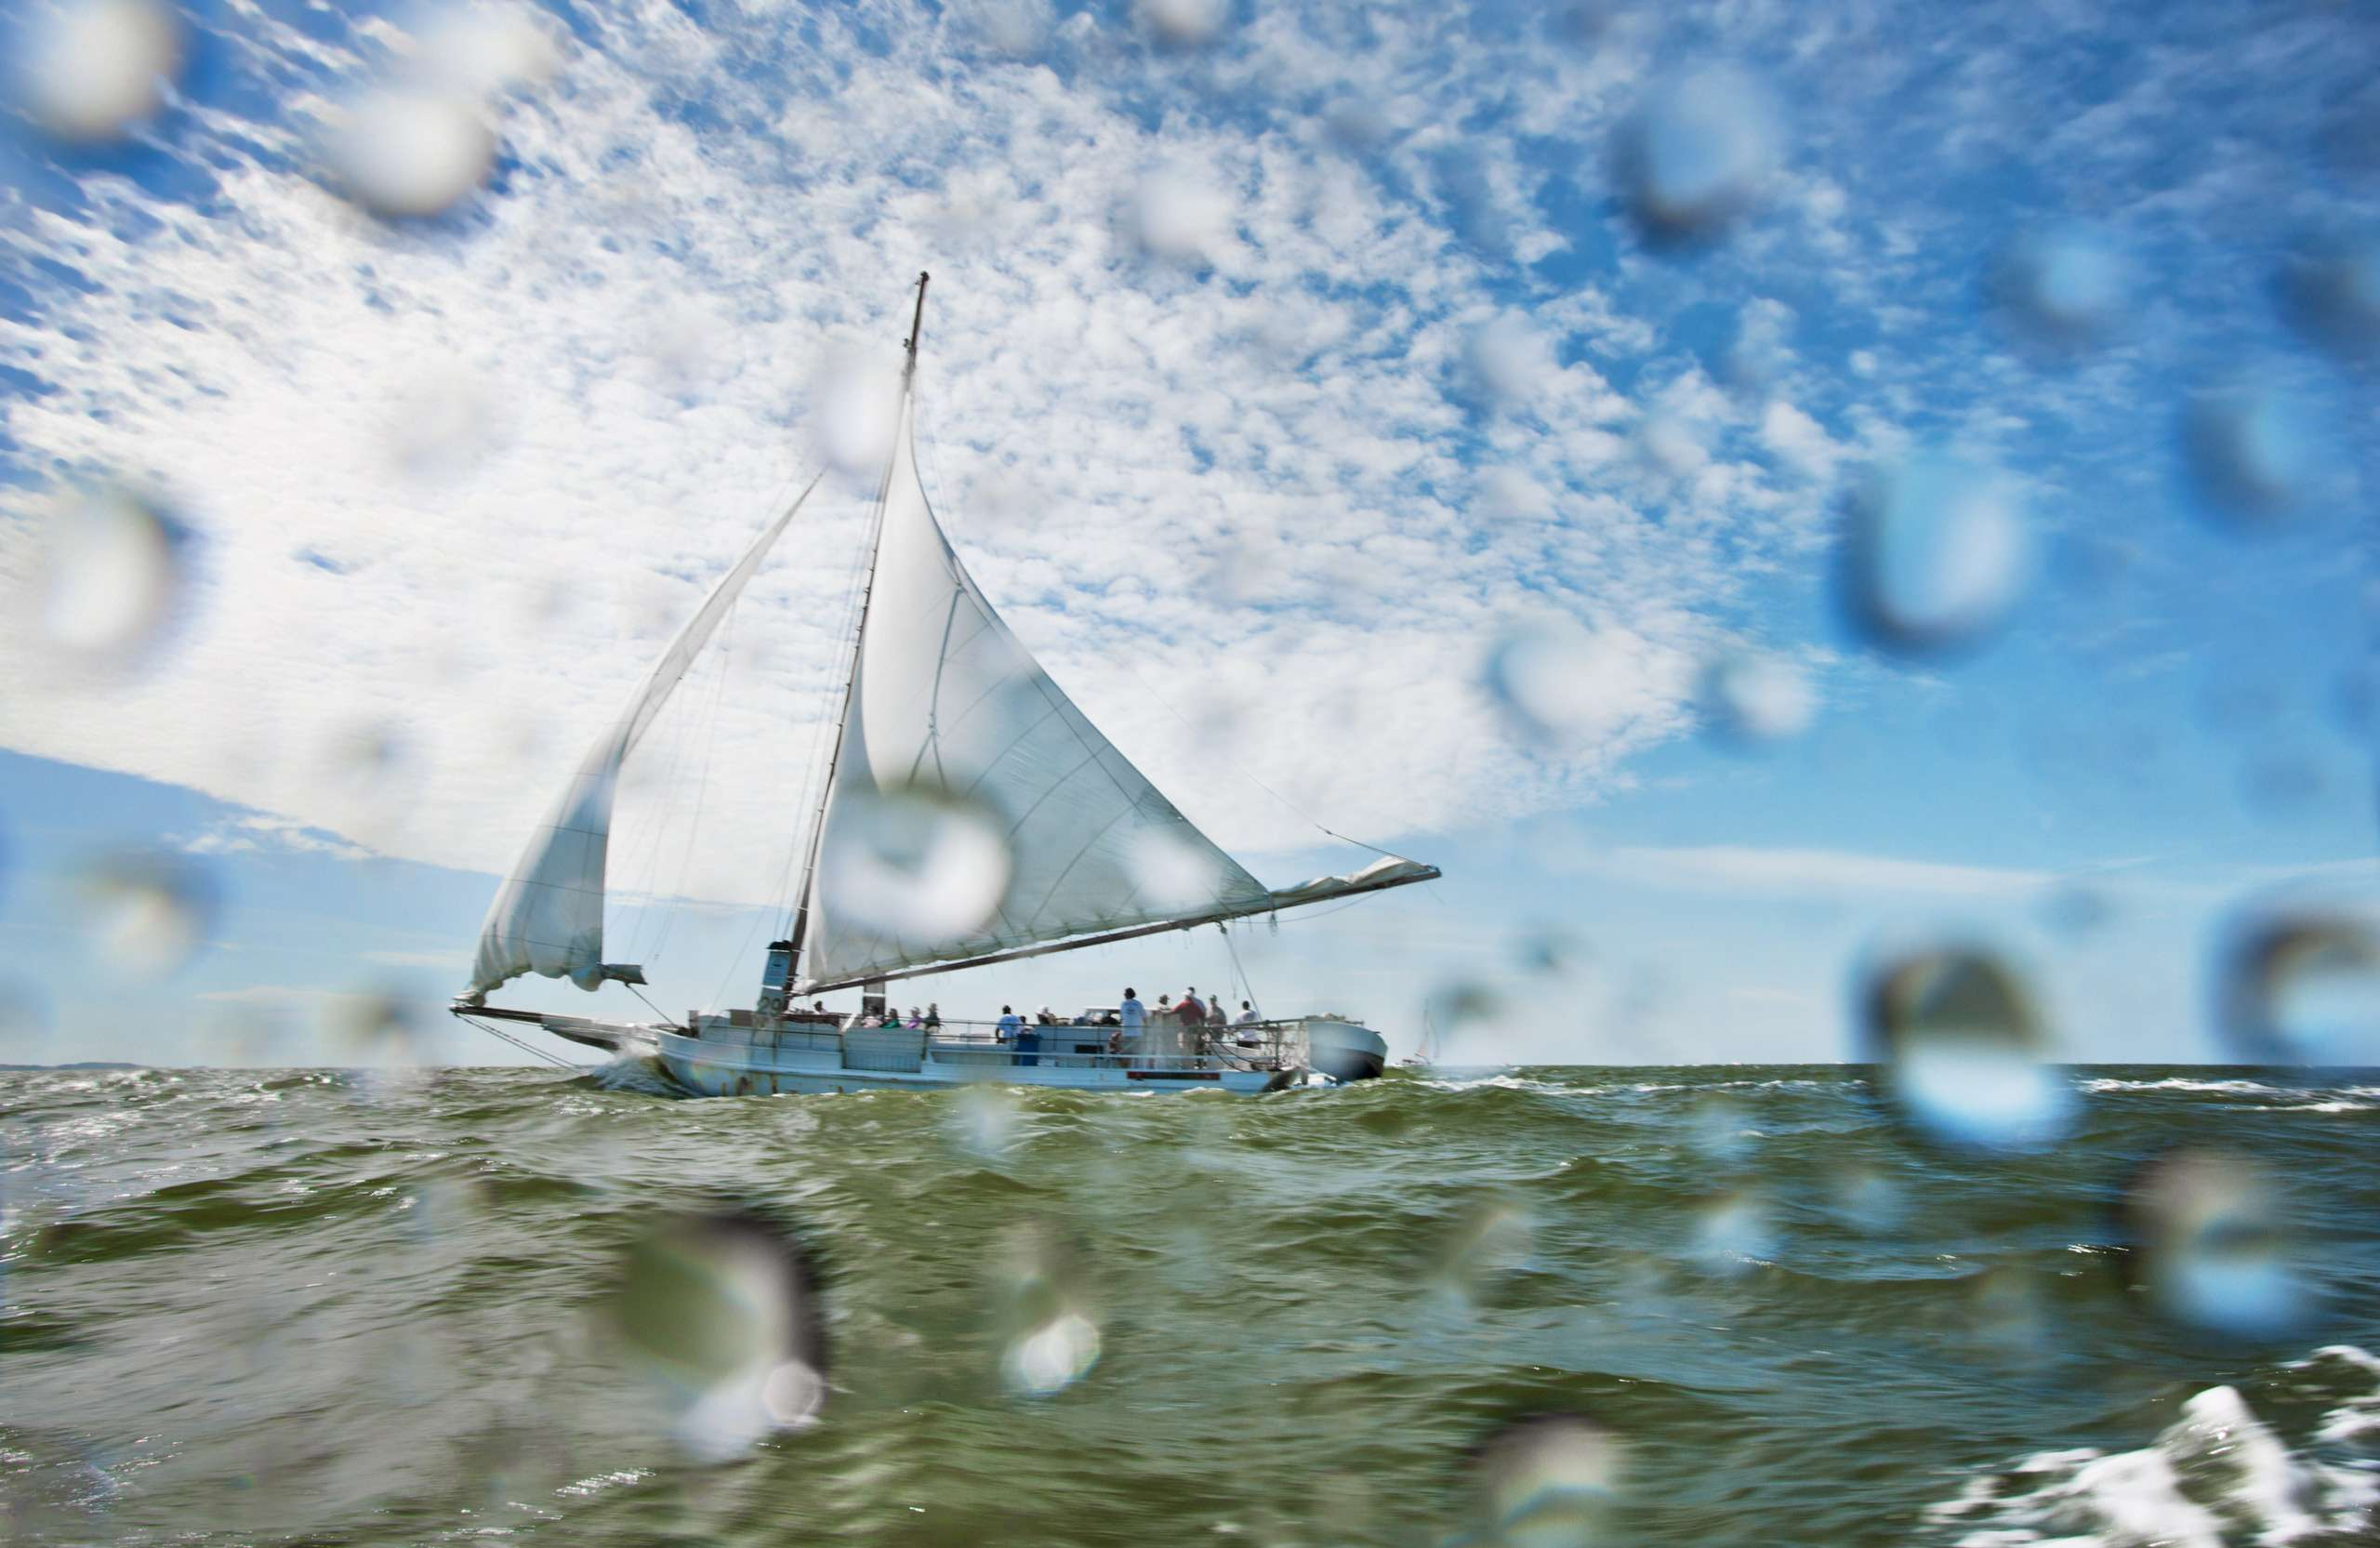 PORTFOLIO - Sailing - Skipjacks #3   PCG758